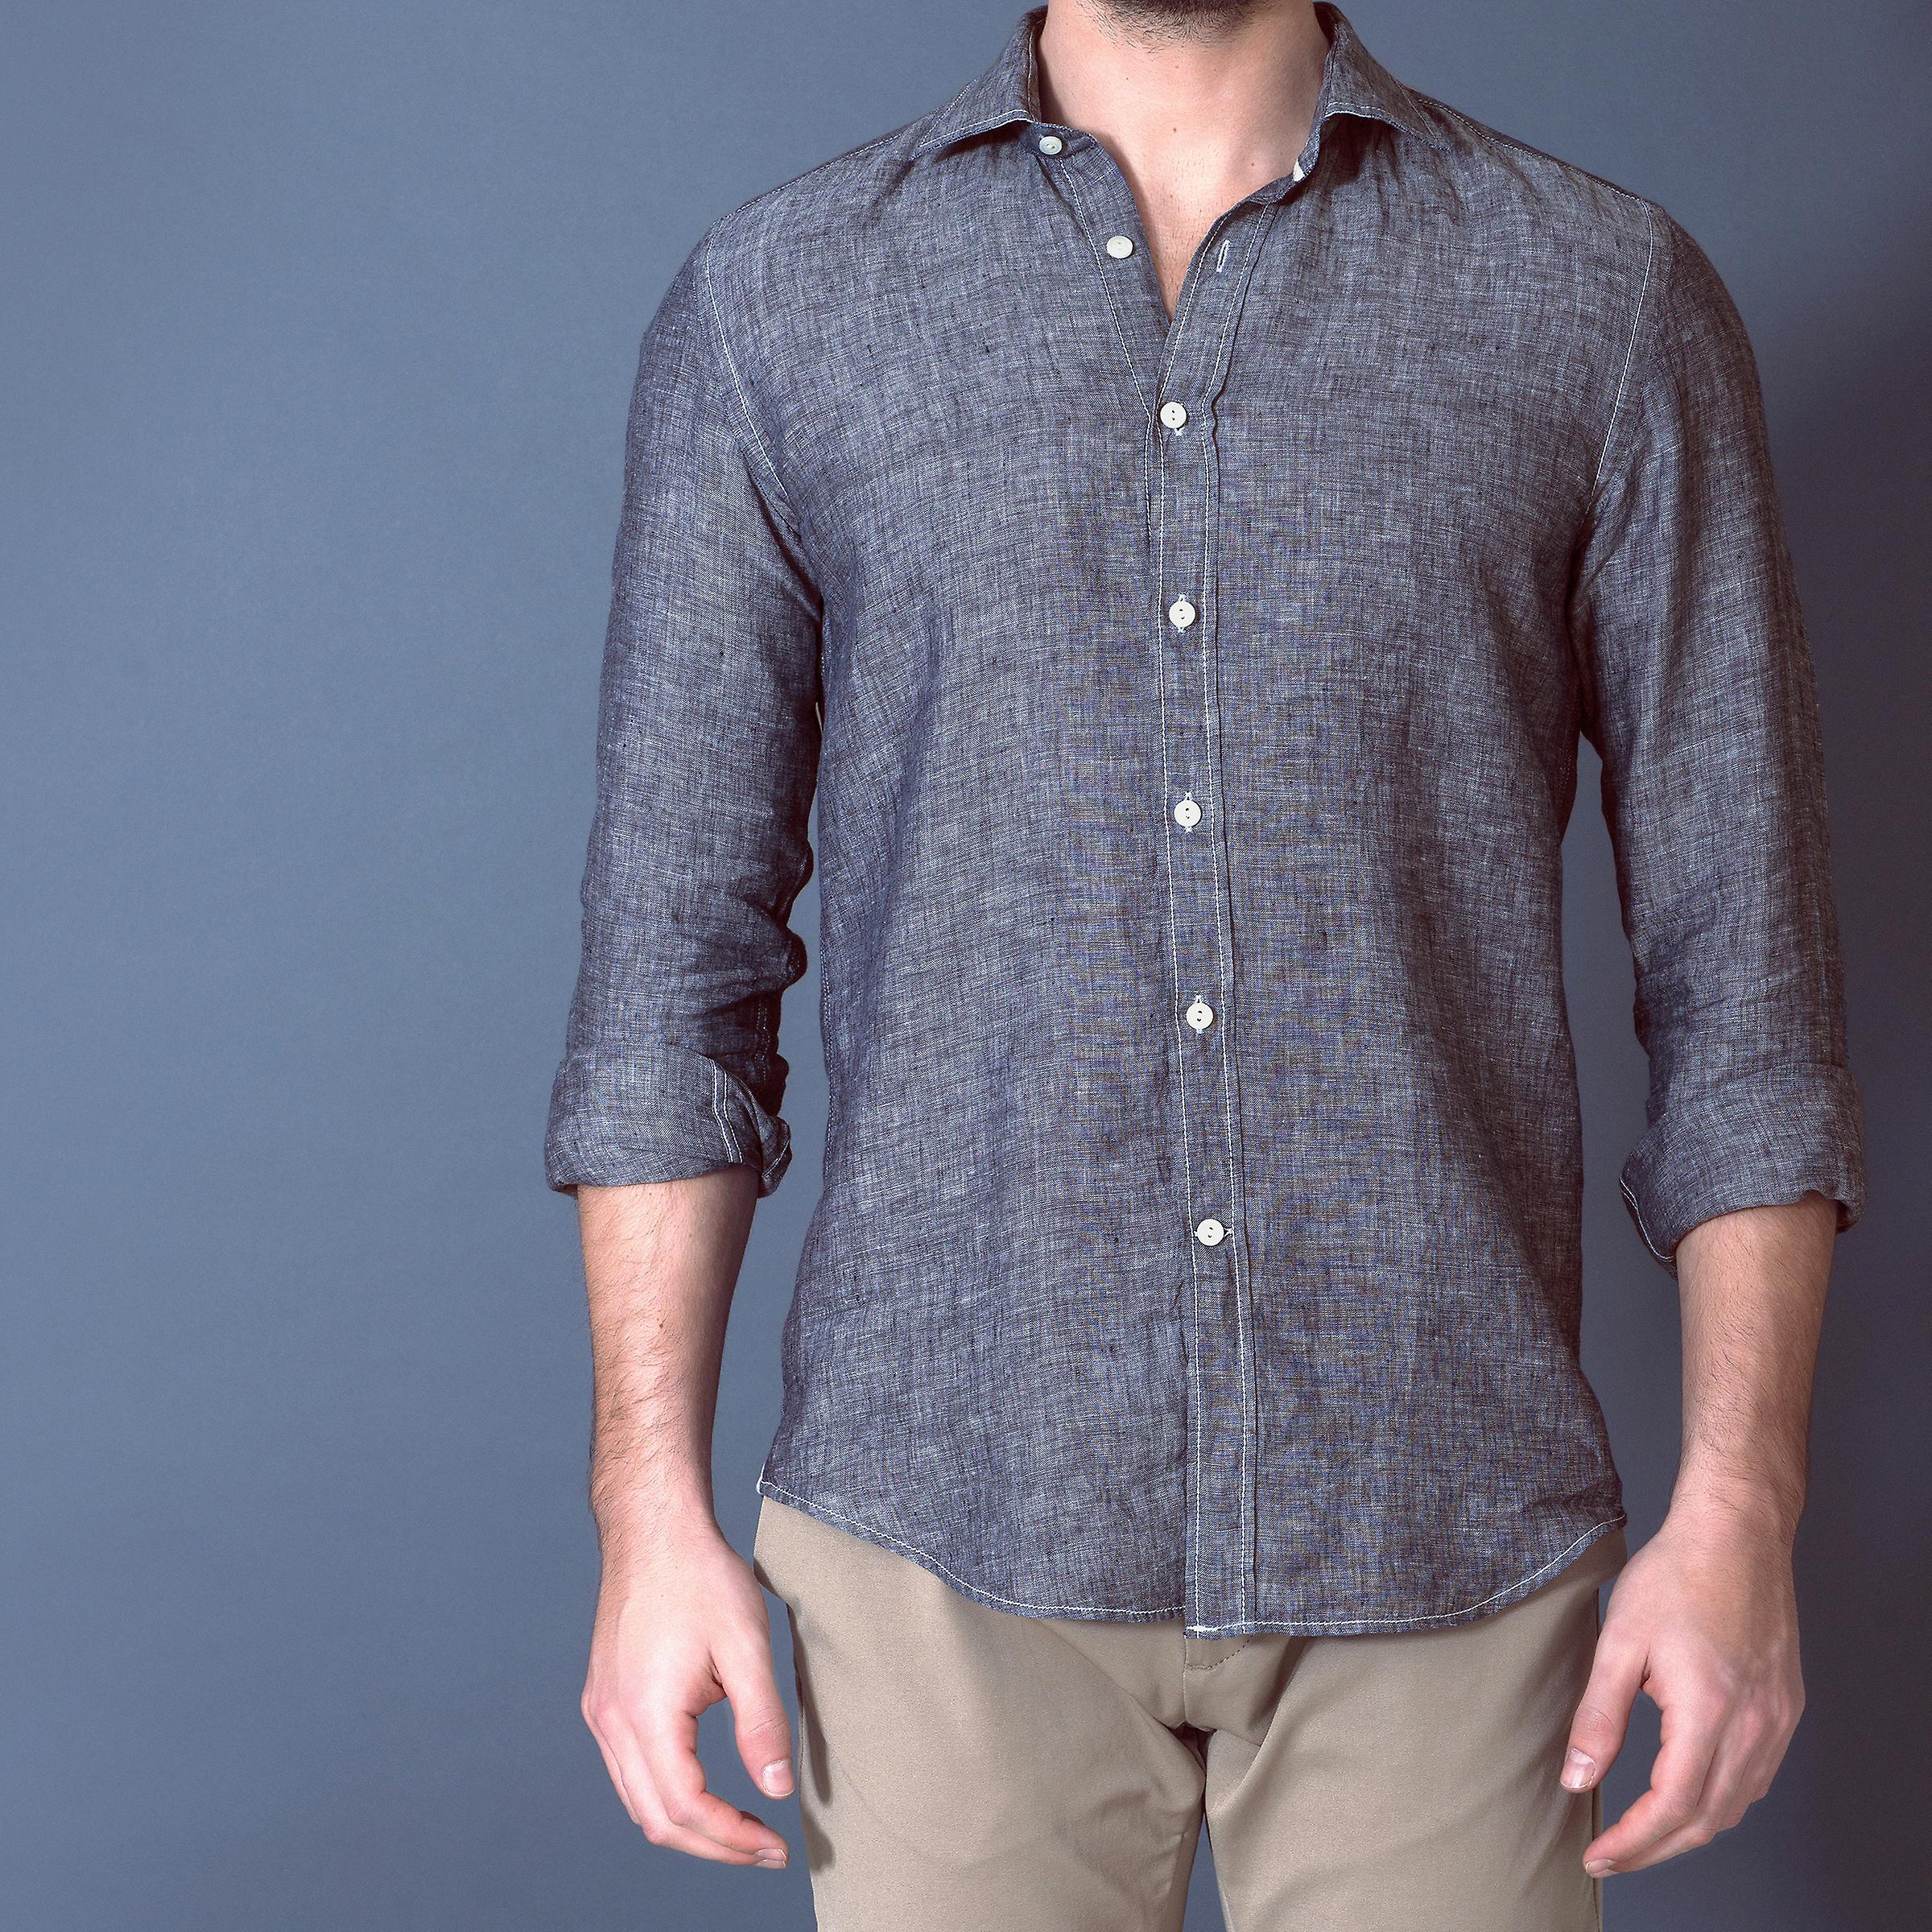 Fabio Giovanni Mercato Shirt - High Quality Italian Linen Casual Shirt